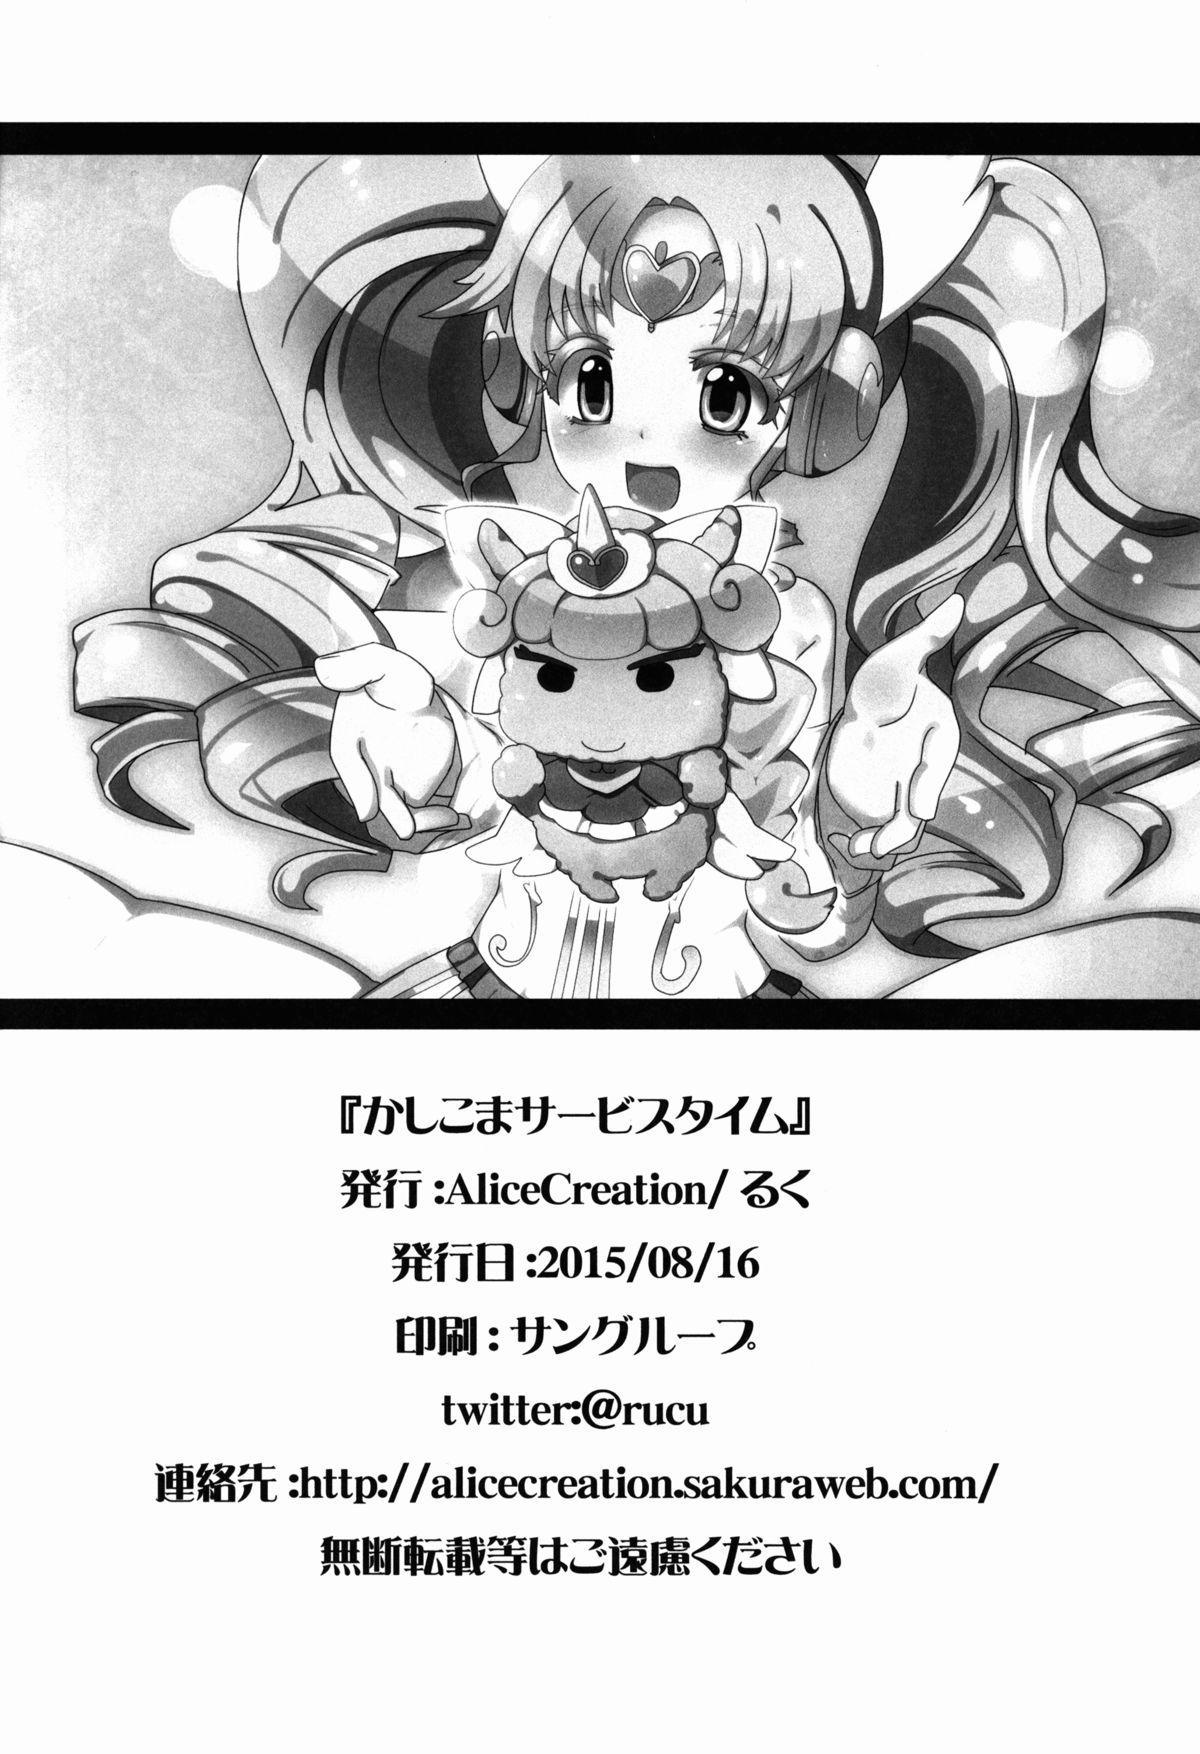 Kashikoma Service Time 25